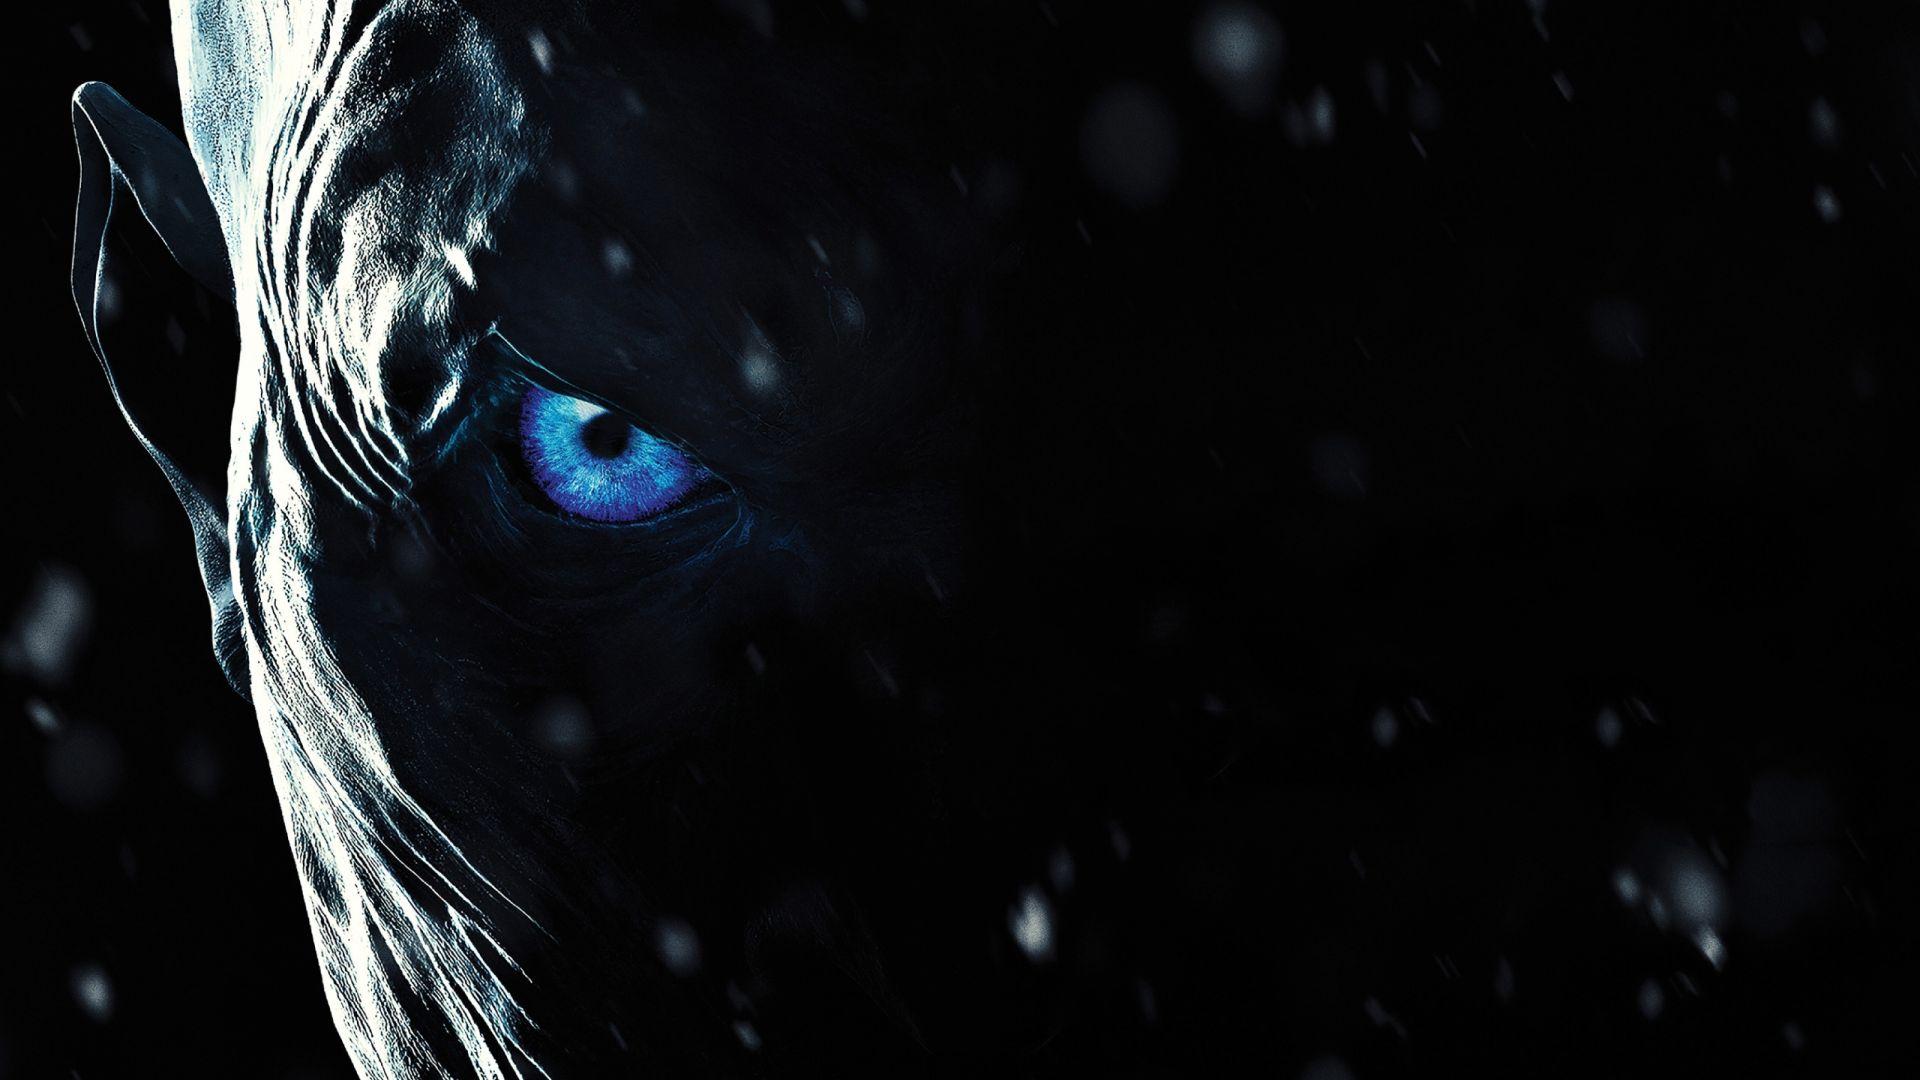 Game of Thrones white walker dark